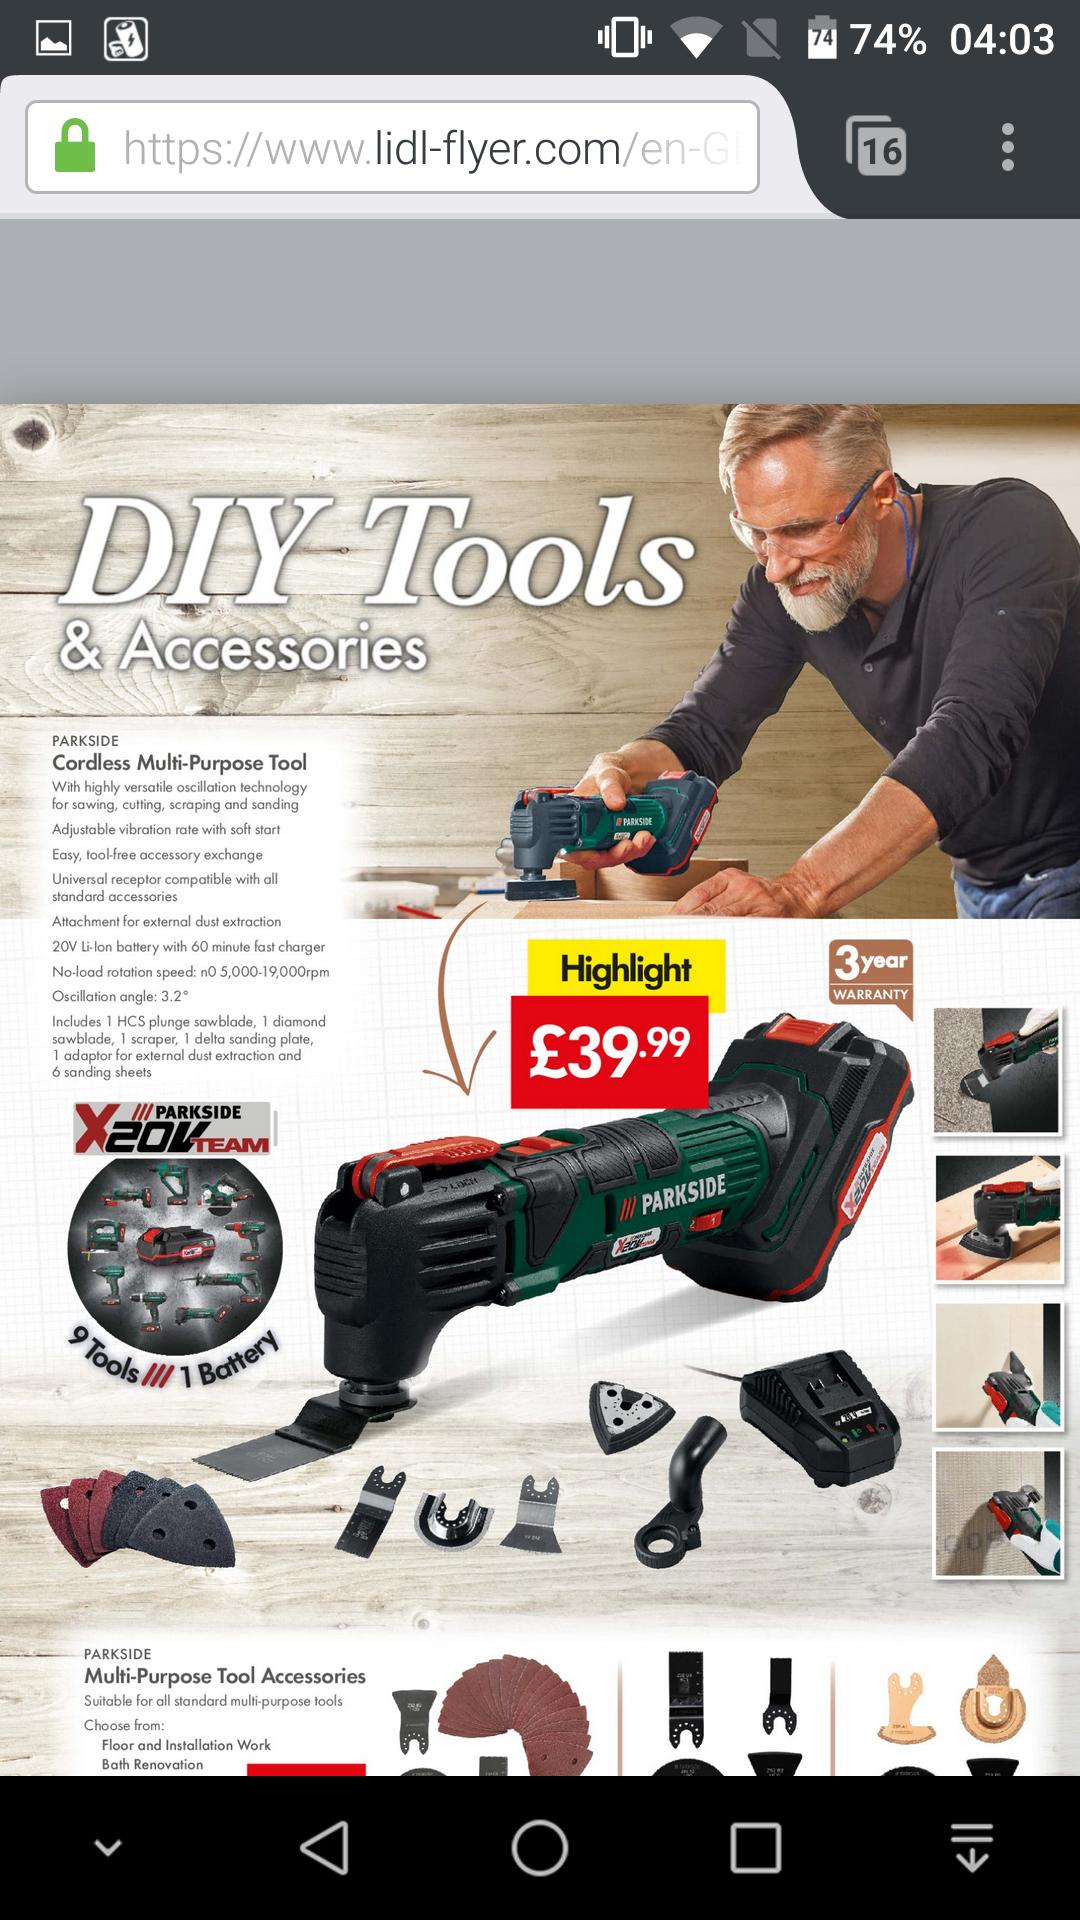 Parkside 20volt cordless multi-tool @ lidl - £39.99